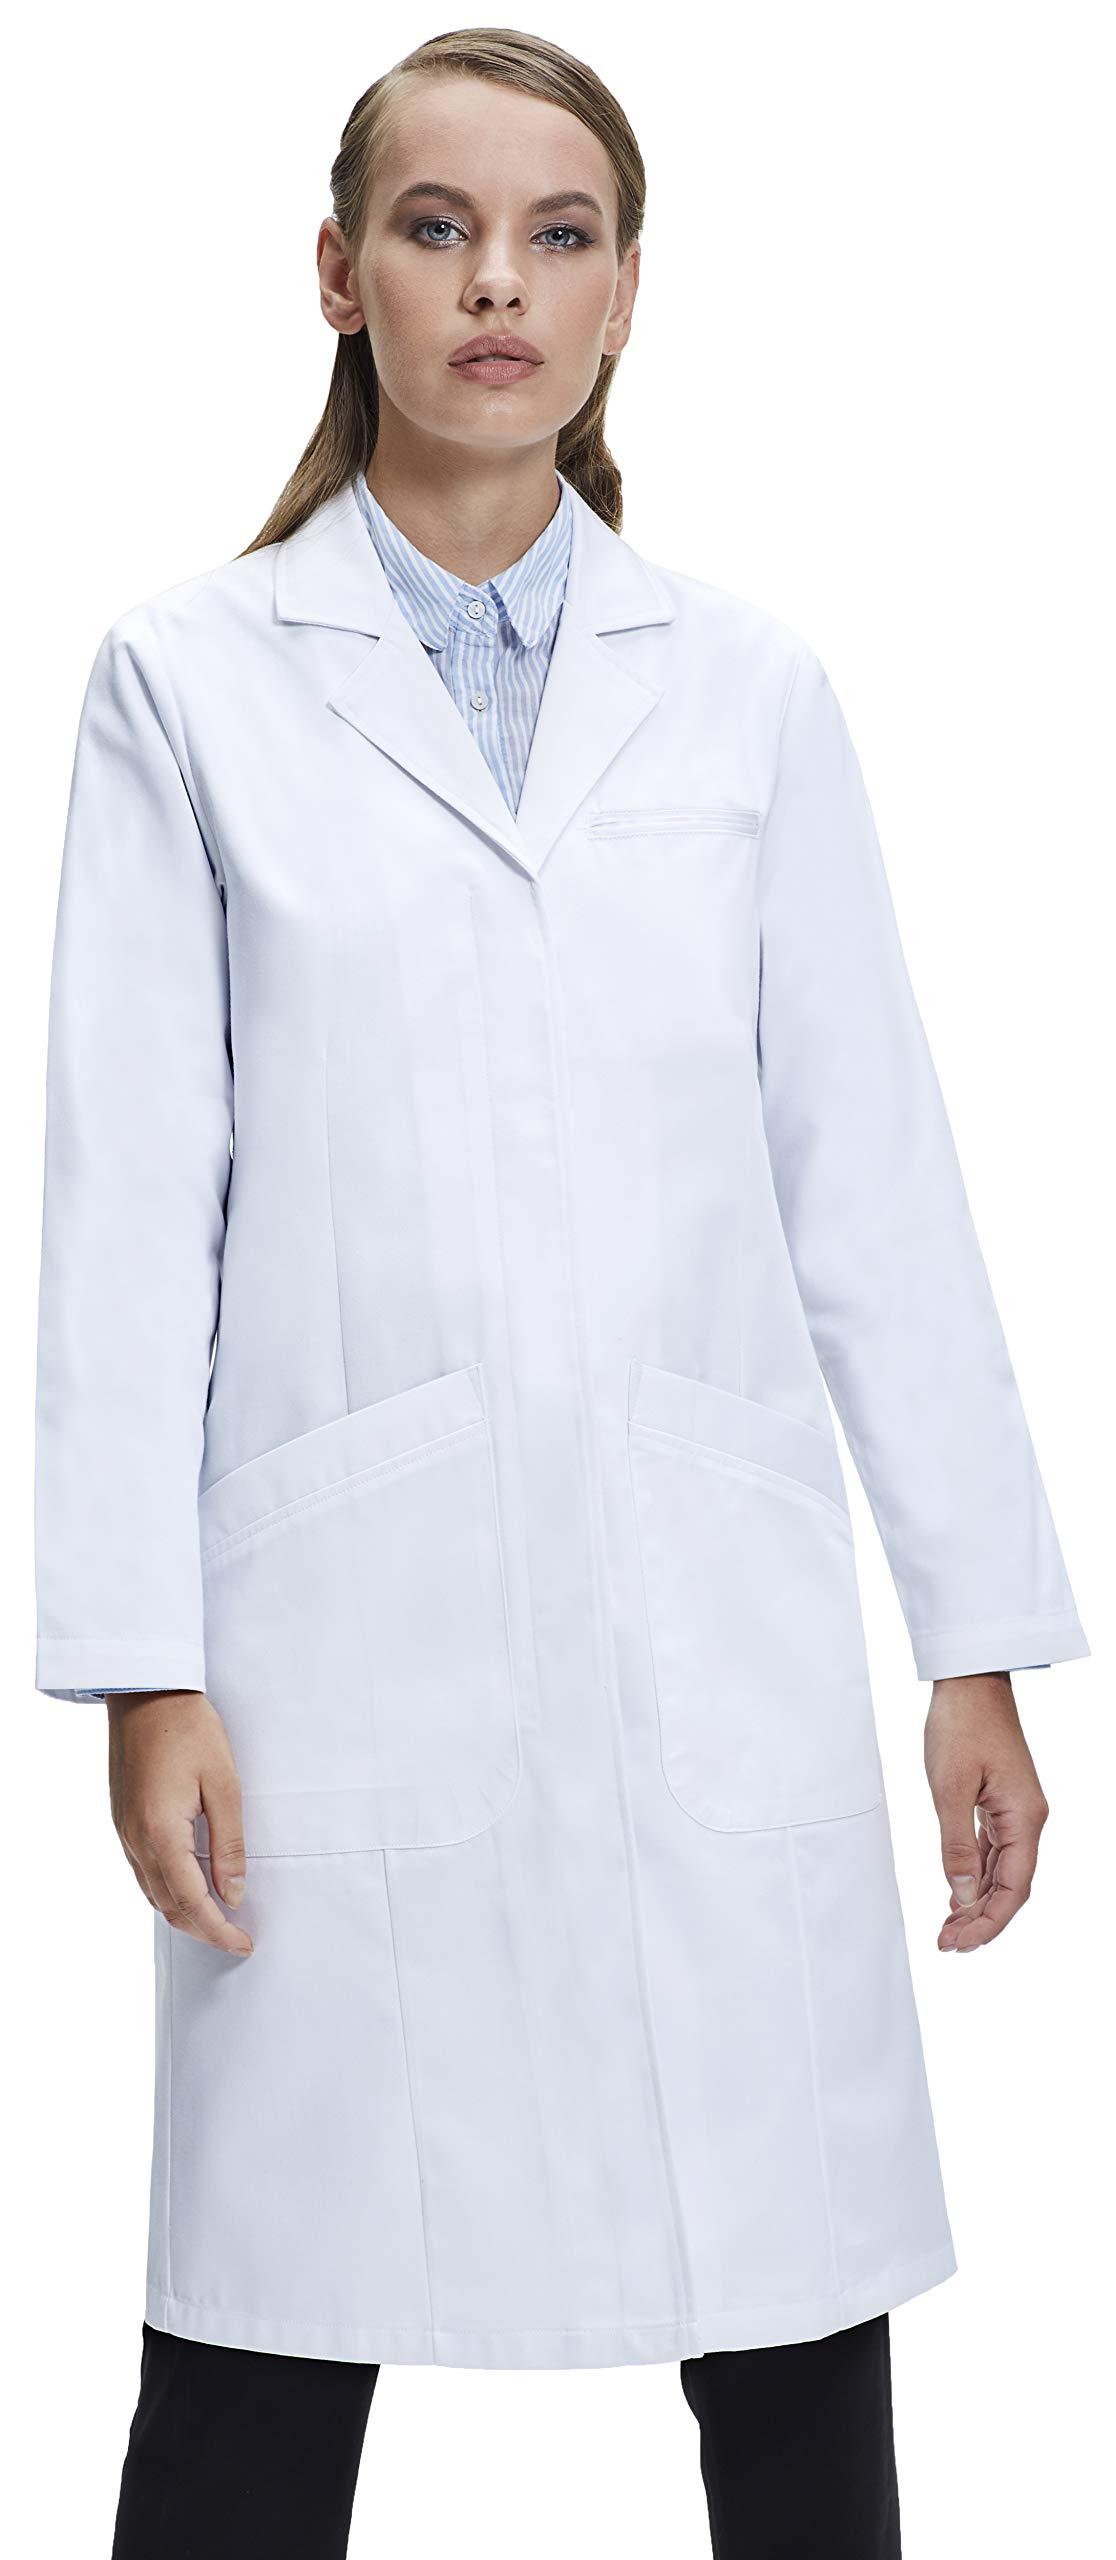 Dr. James Women's Classic Fit Lab Coat (39 Inch Length) US 6